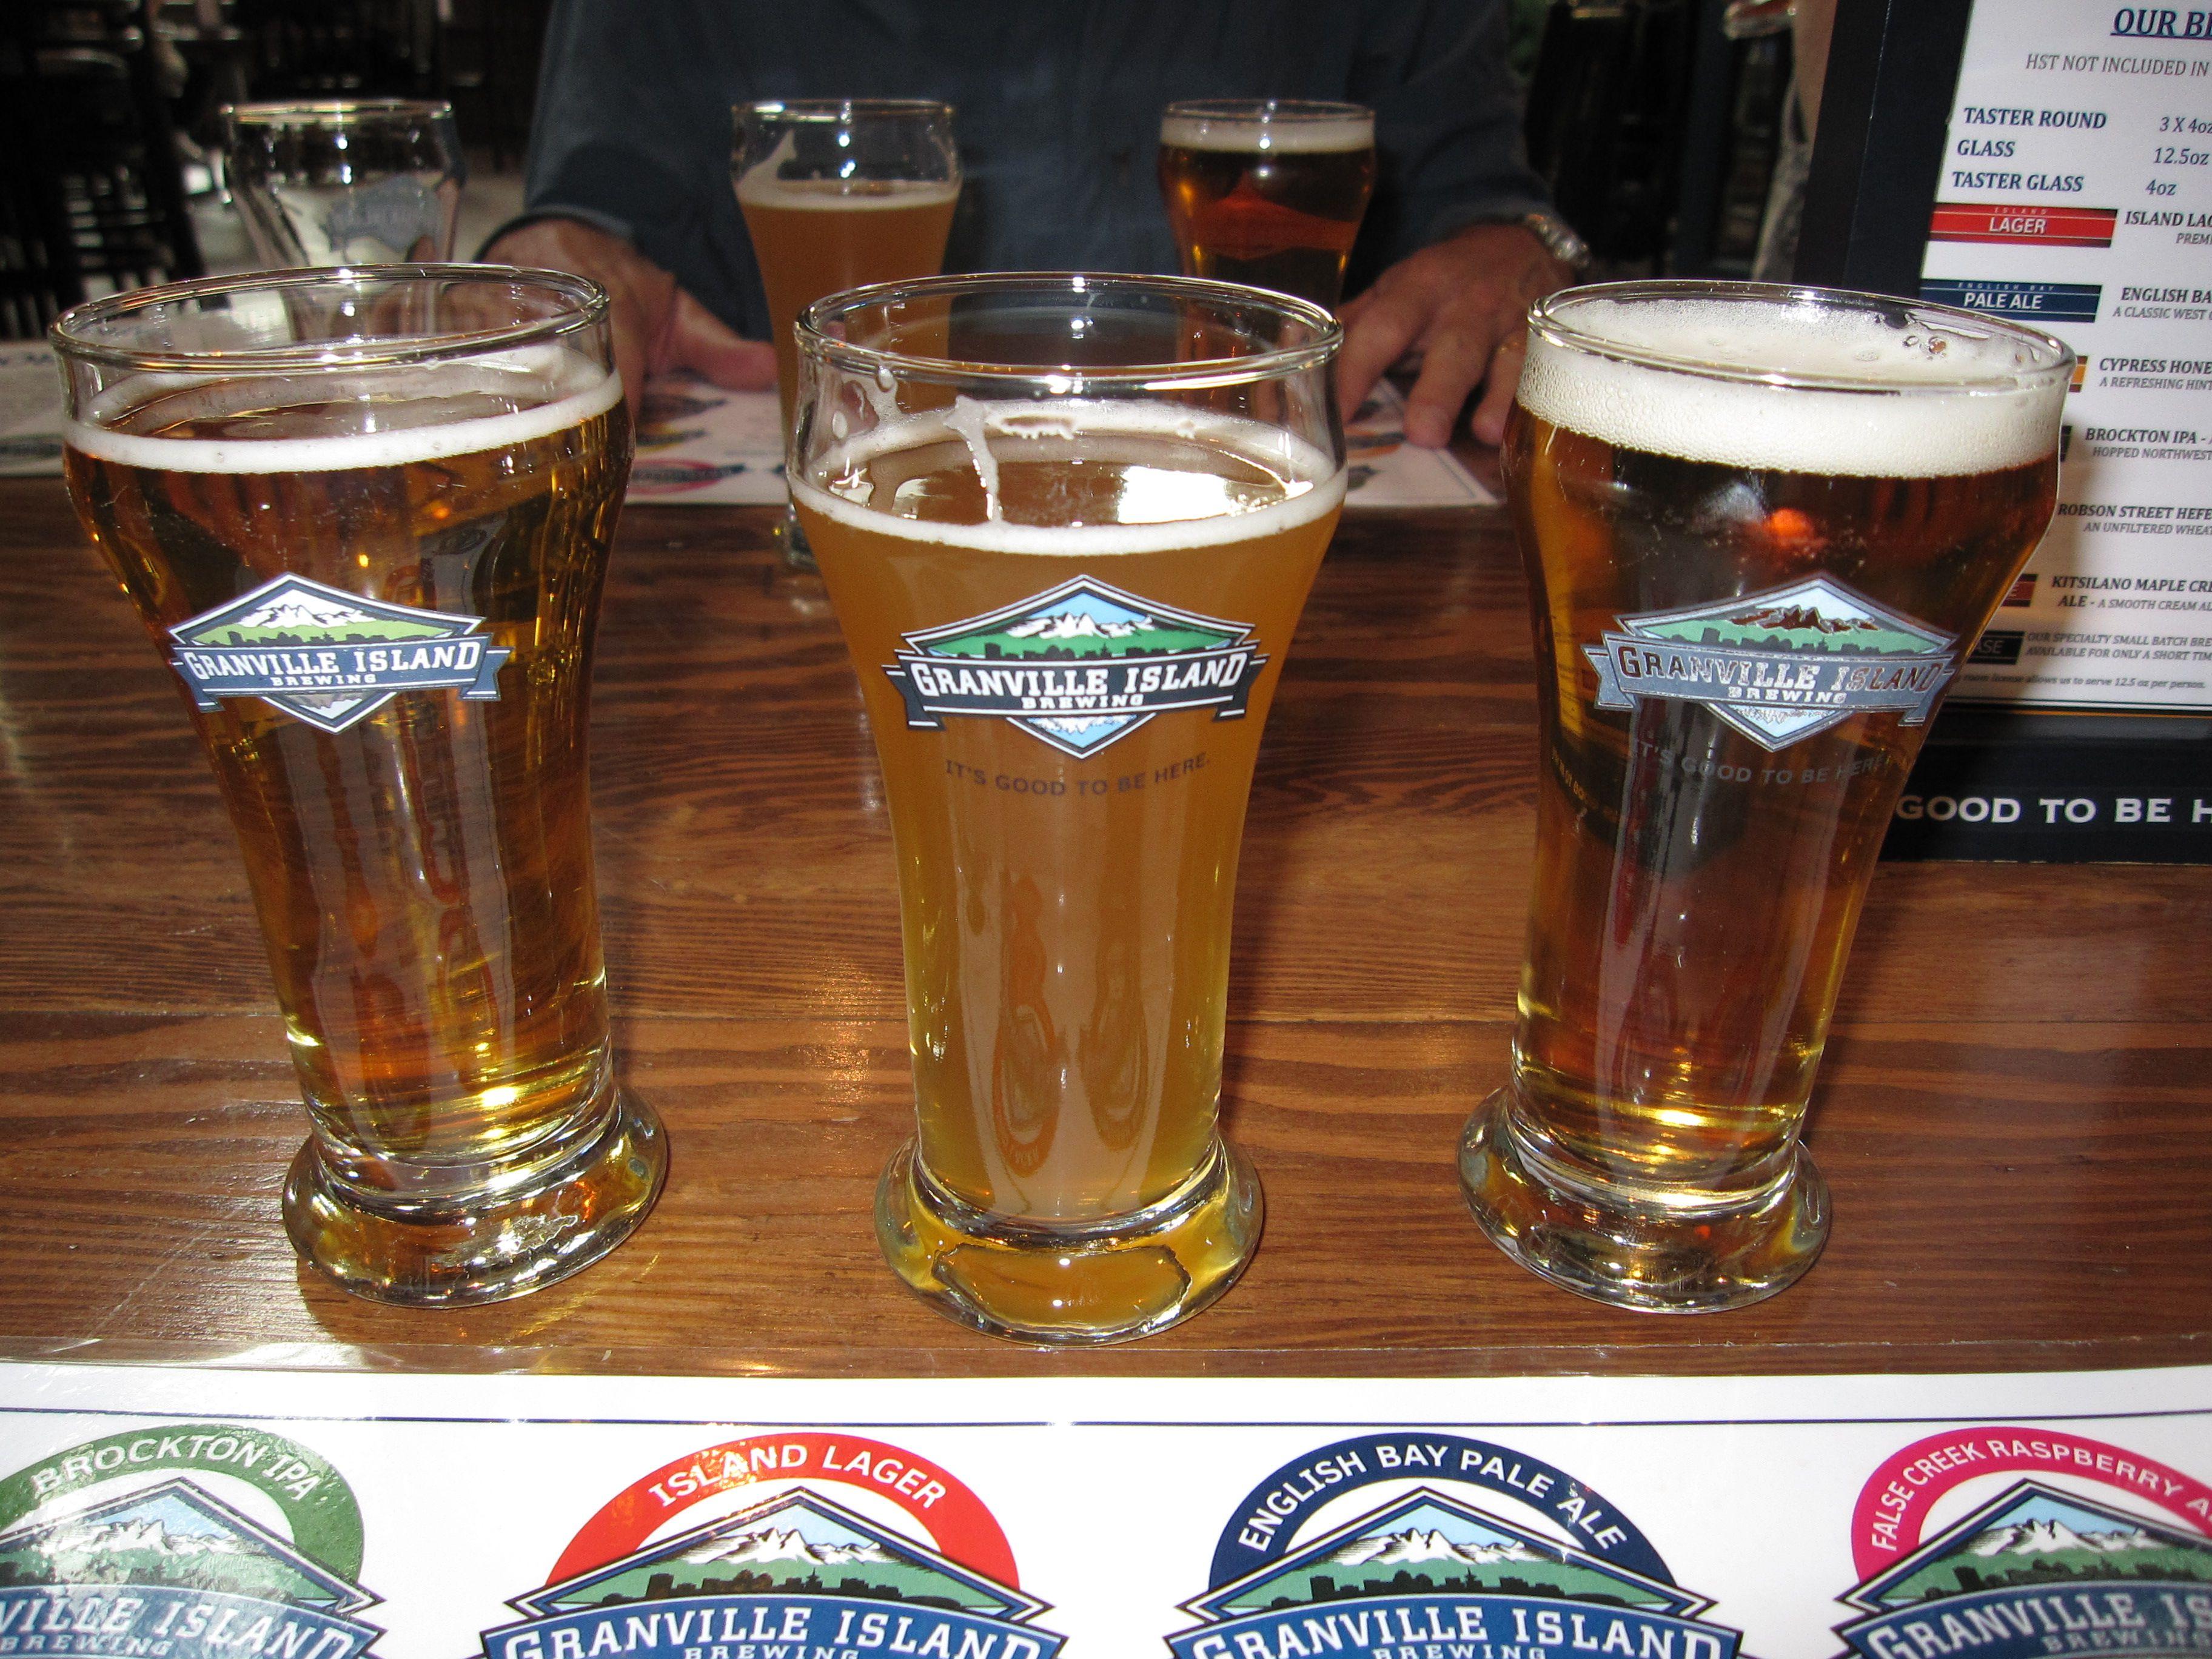 Granville Island Tour Beer